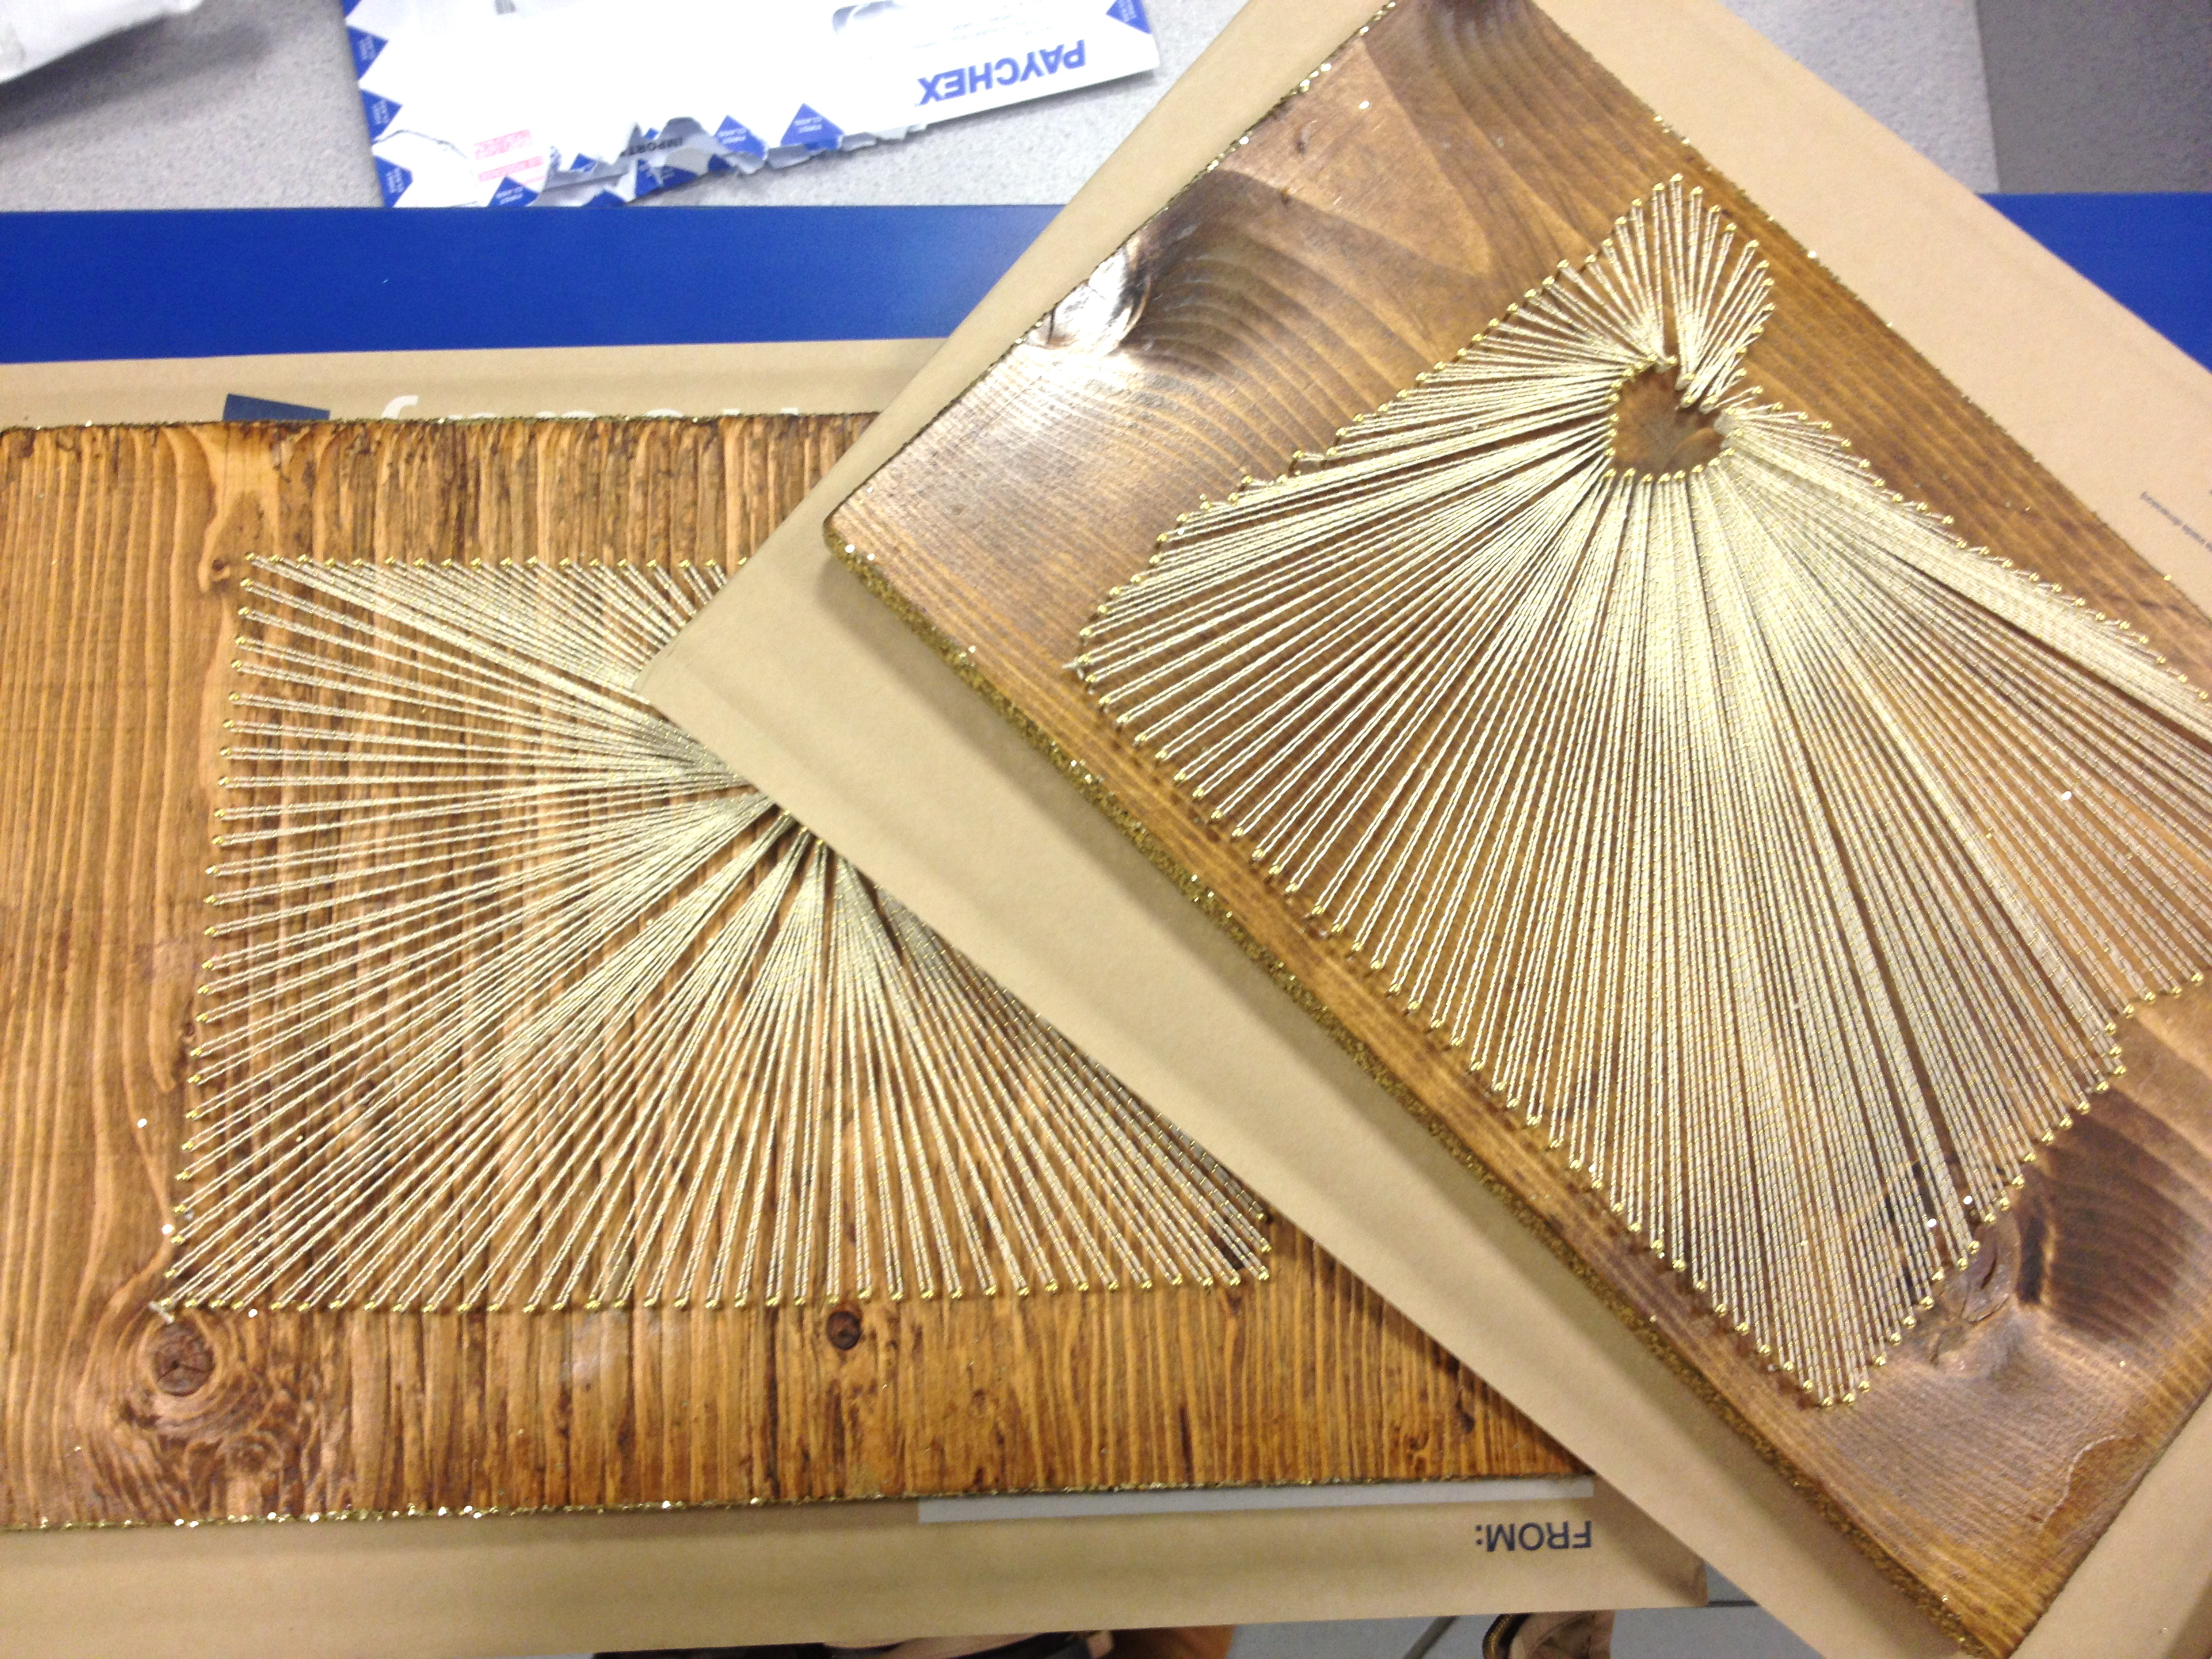 diy – string-art state boards | the brass blossom